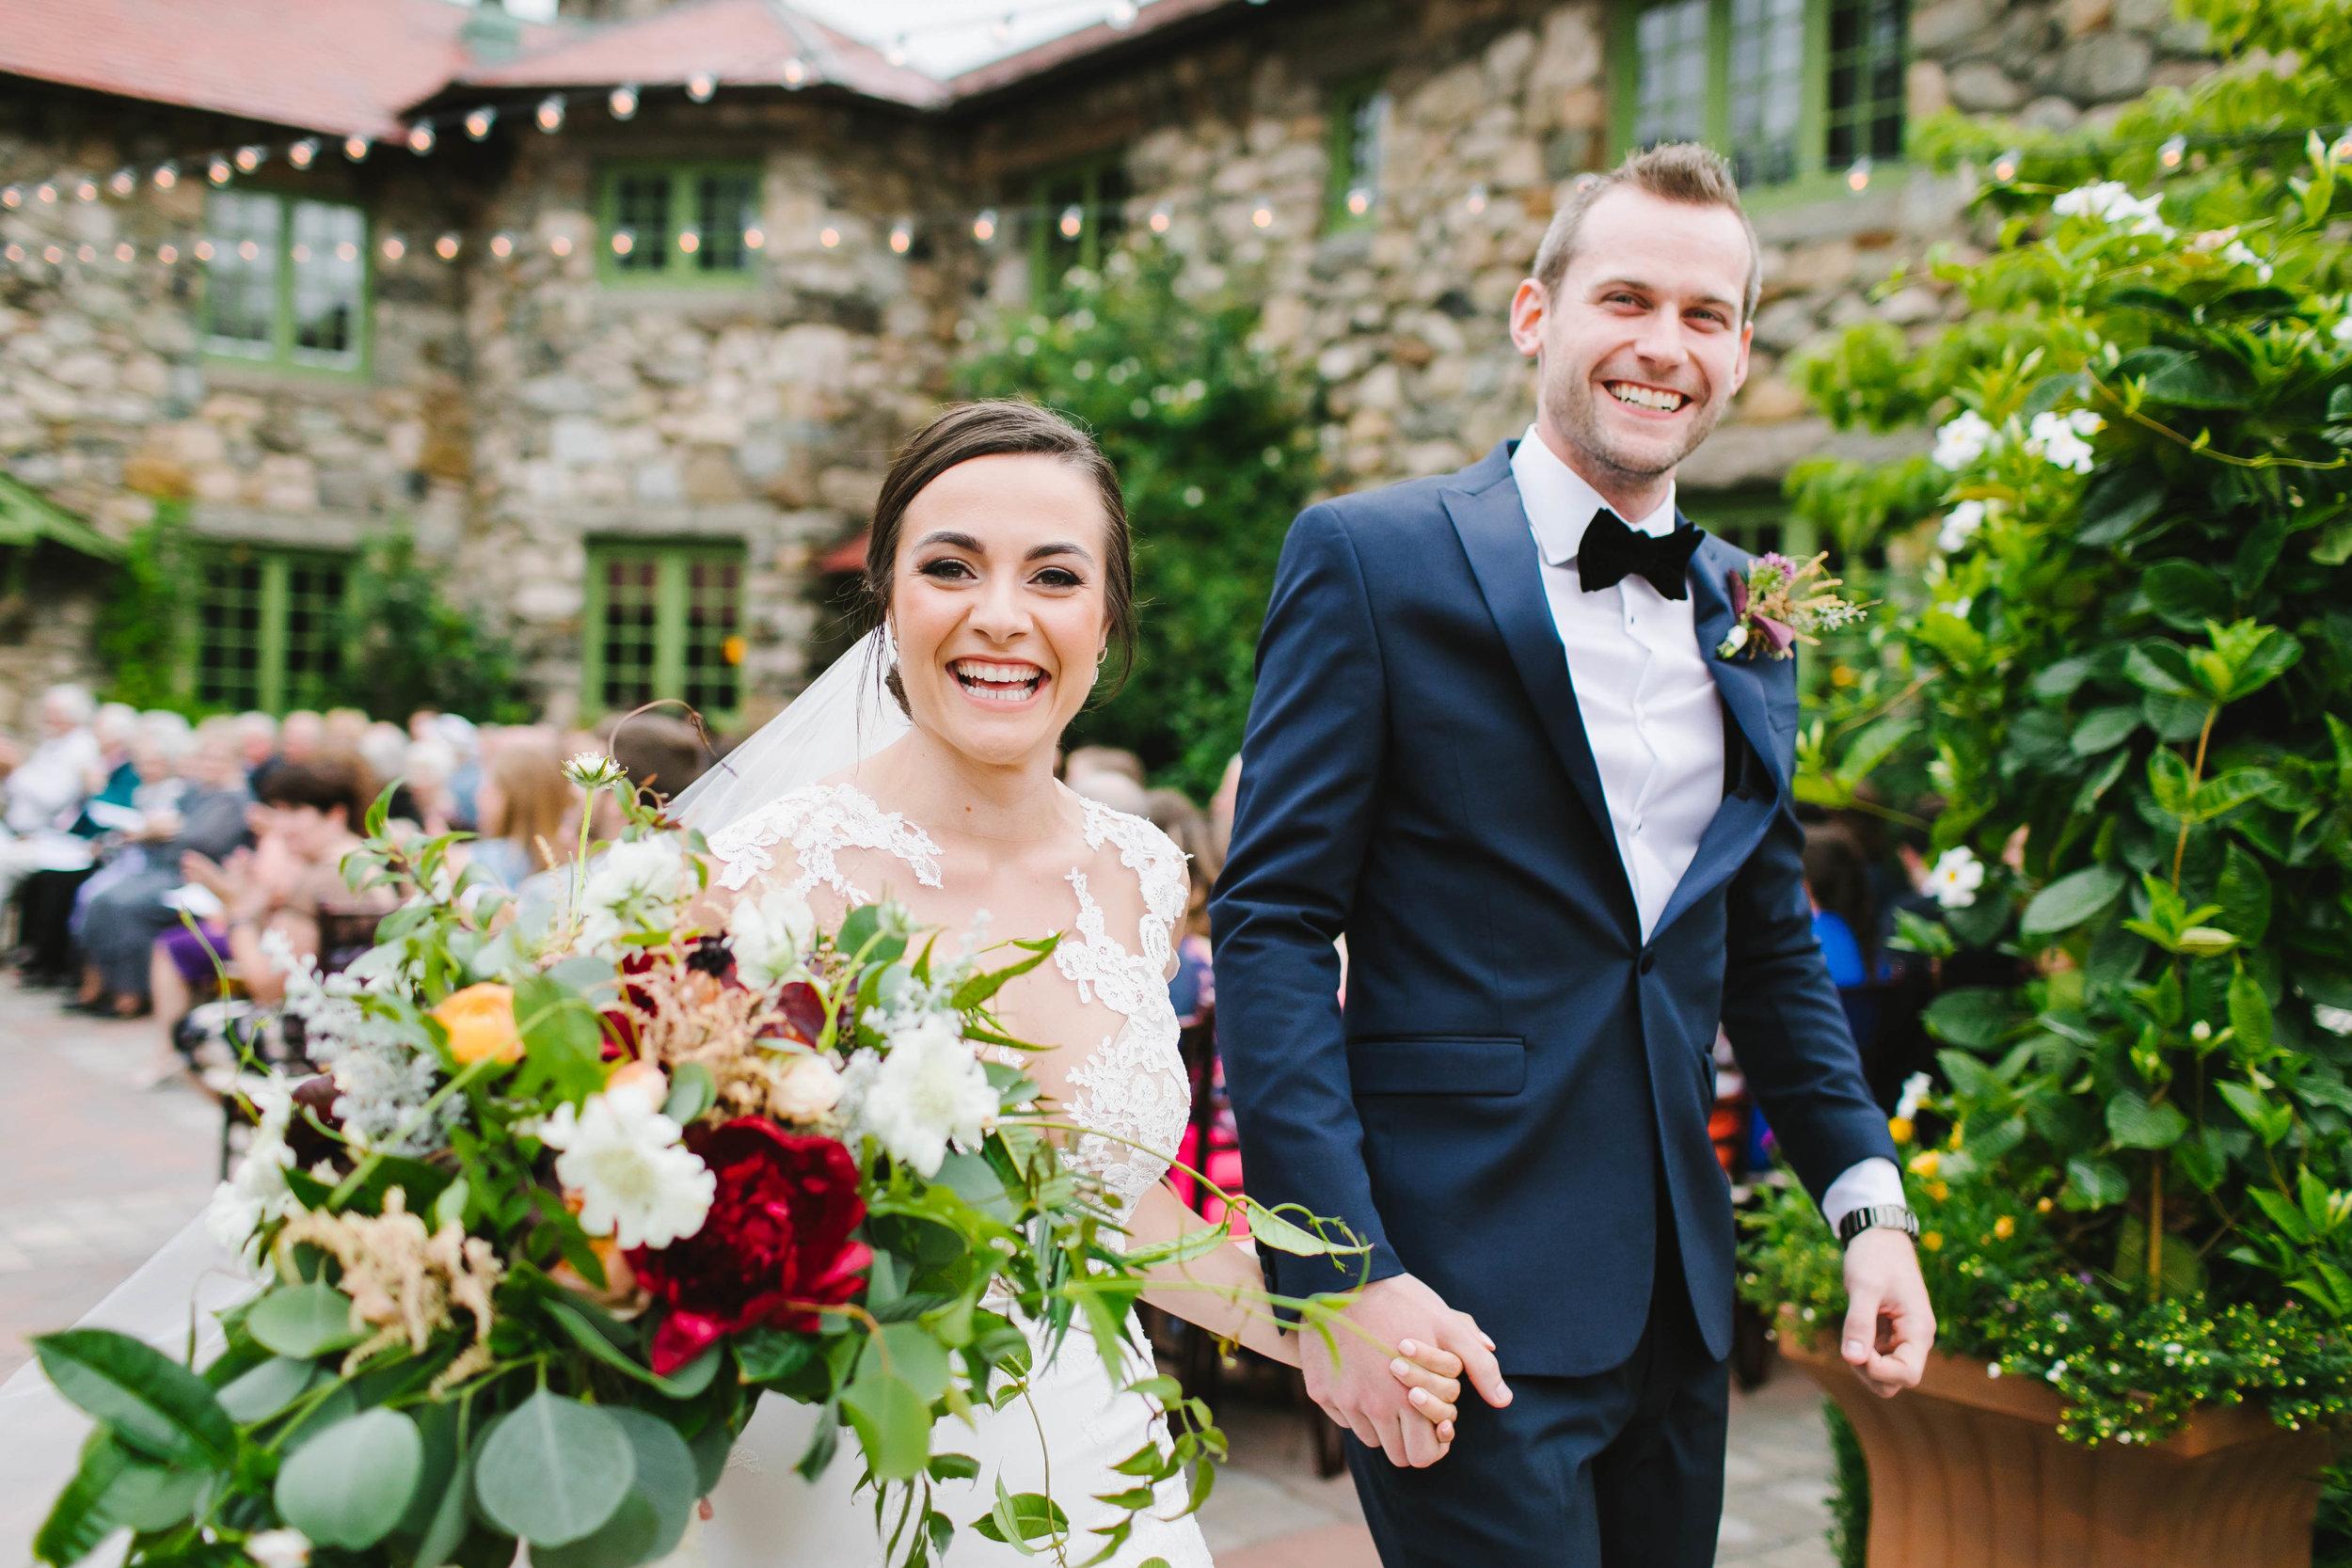 Willowdale Estate Wedding Boston Topsfield MA Italian Garden mansion house wedding - Emily Tebbetts photography-7.jpg